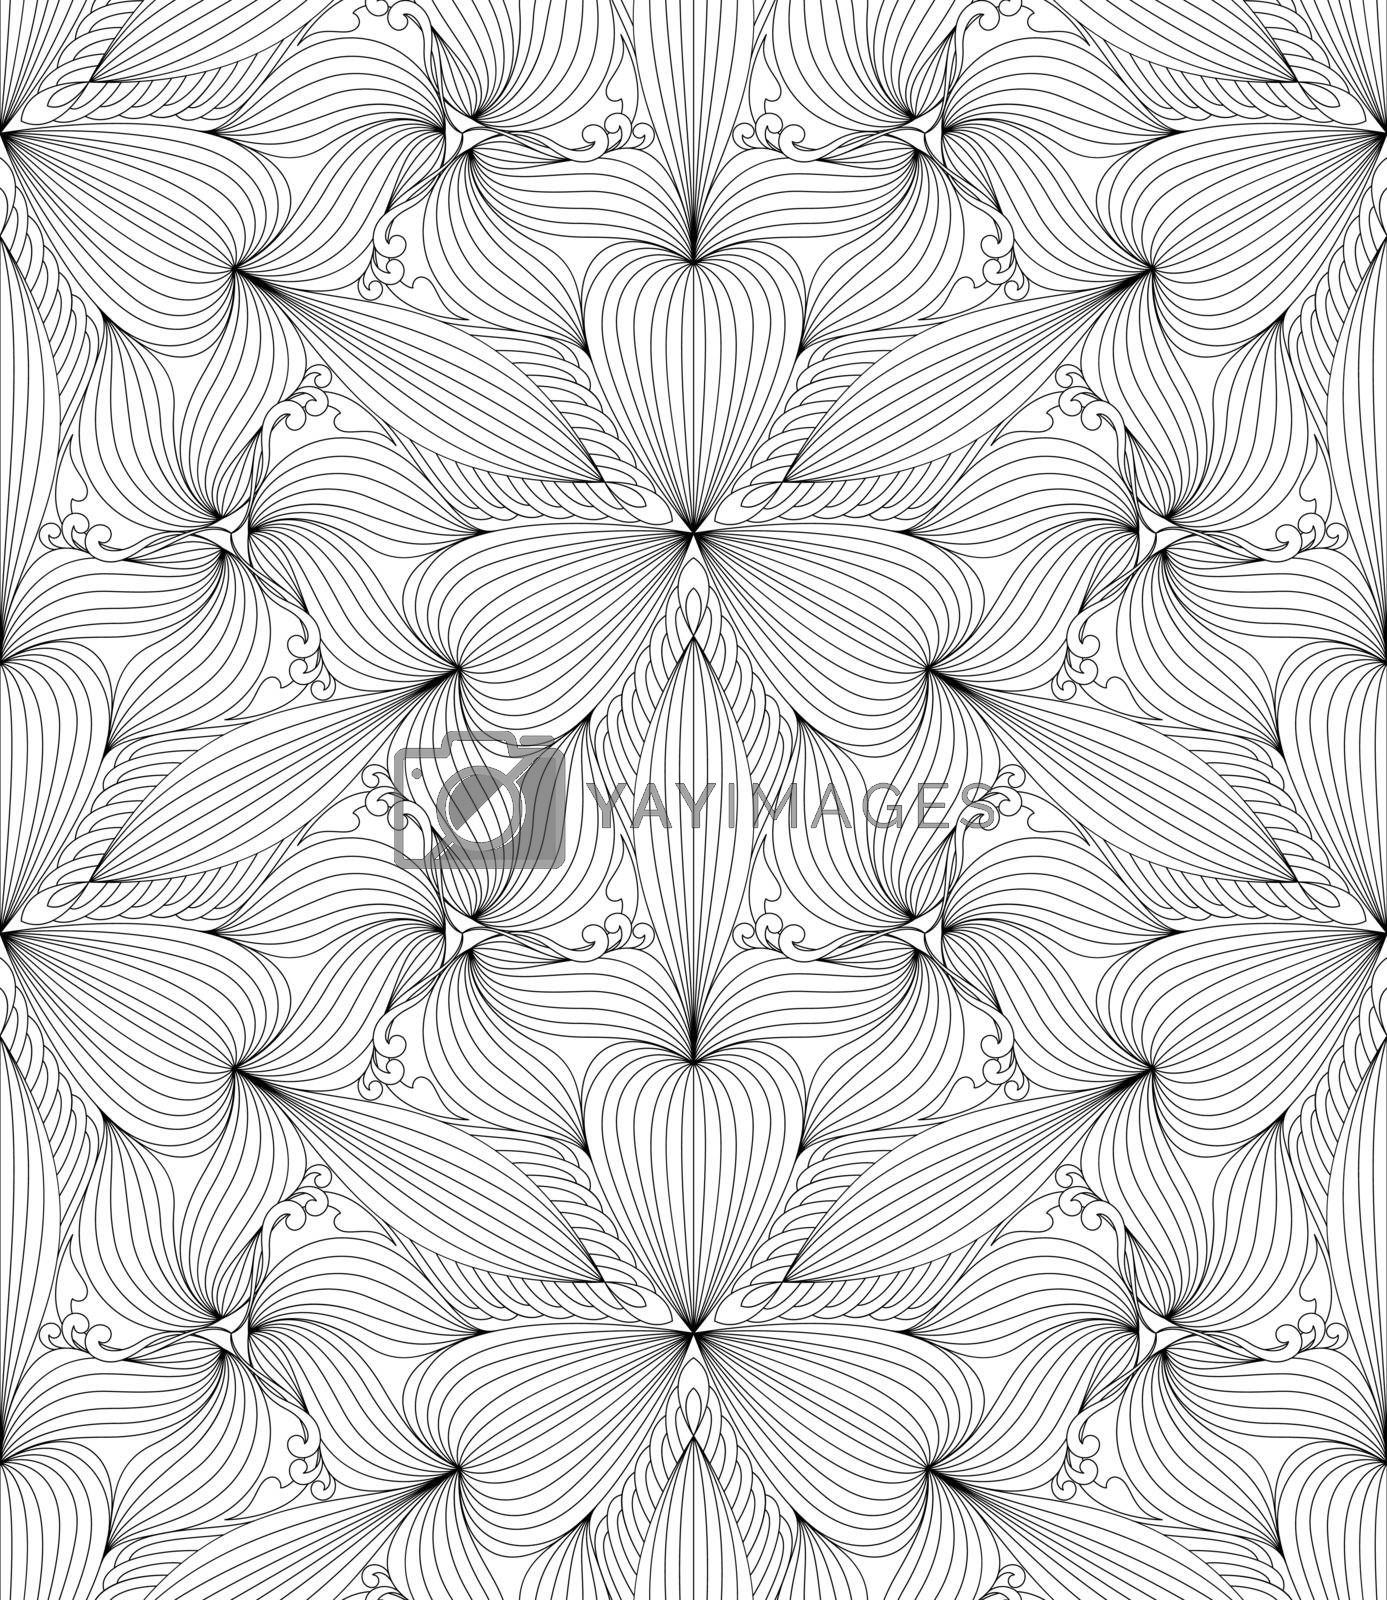 Abstract seamless geometric pattern, vector illustration.